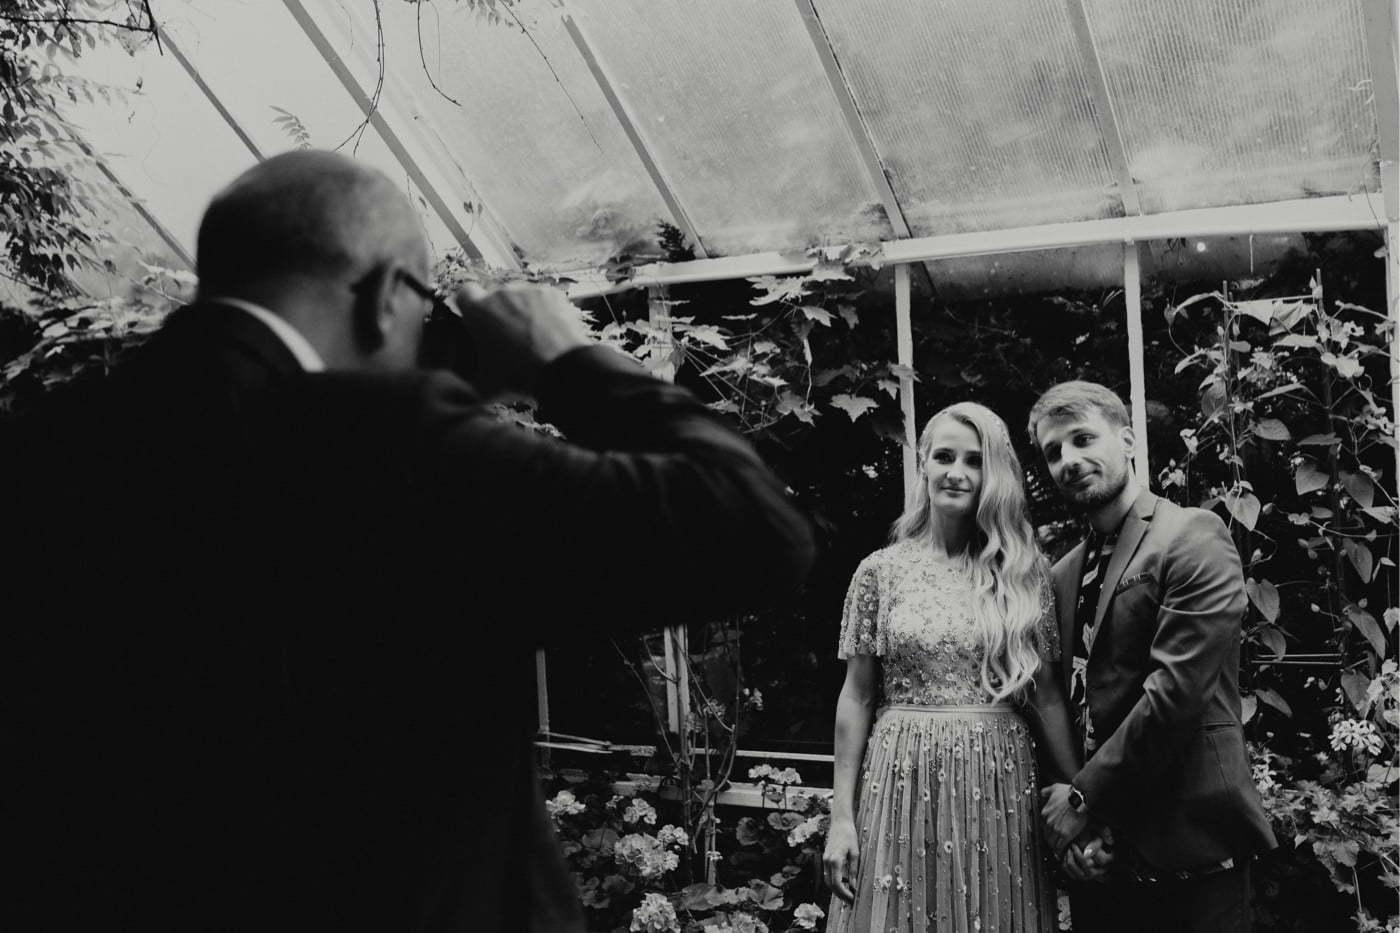 ewelina zieba rustykalne wesele stara oranzeria warszawa 065